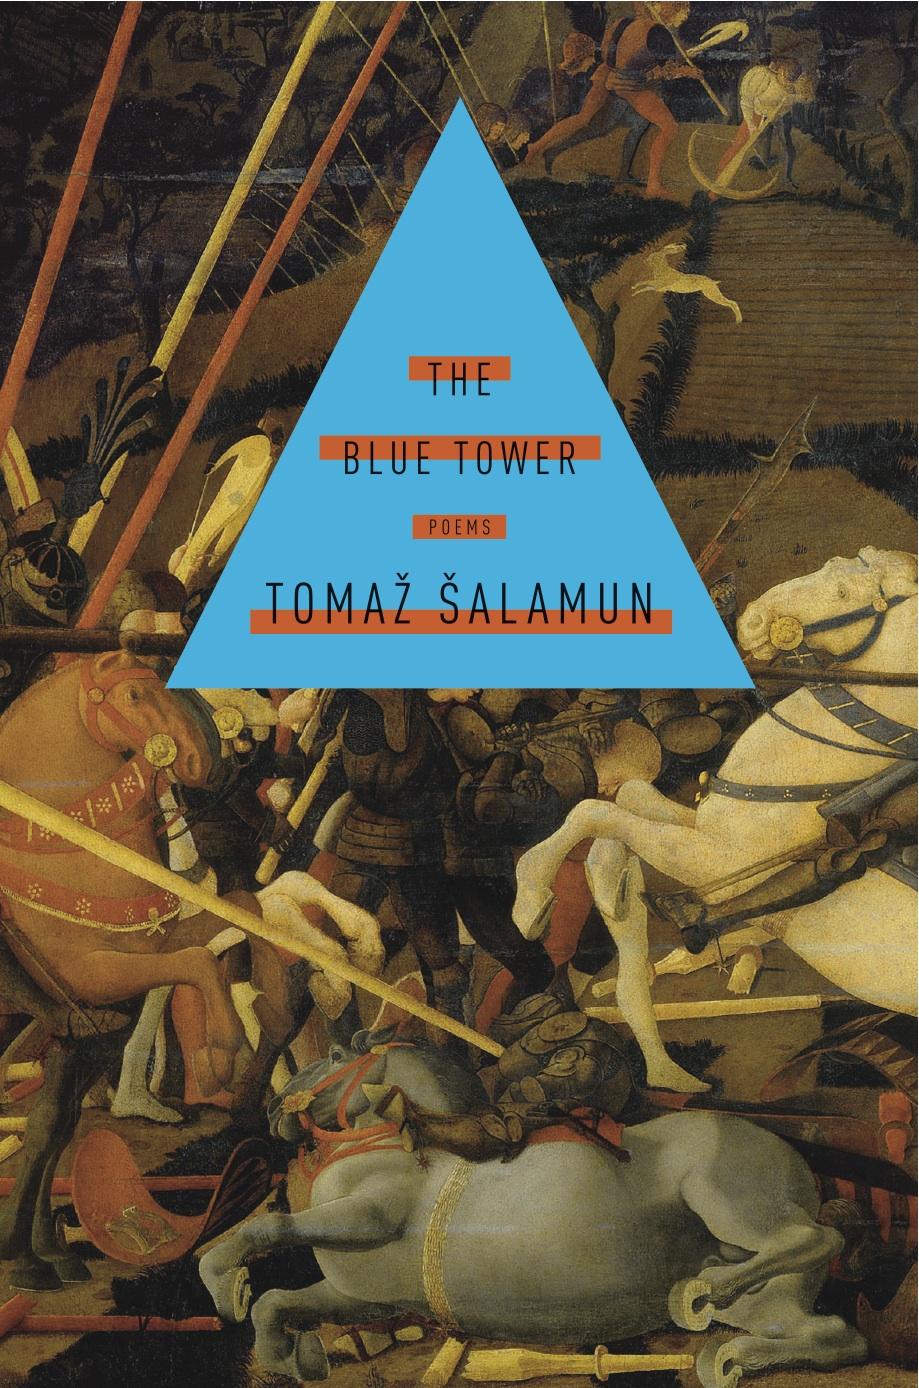 The Blue Tower by Tomaž Åalamun